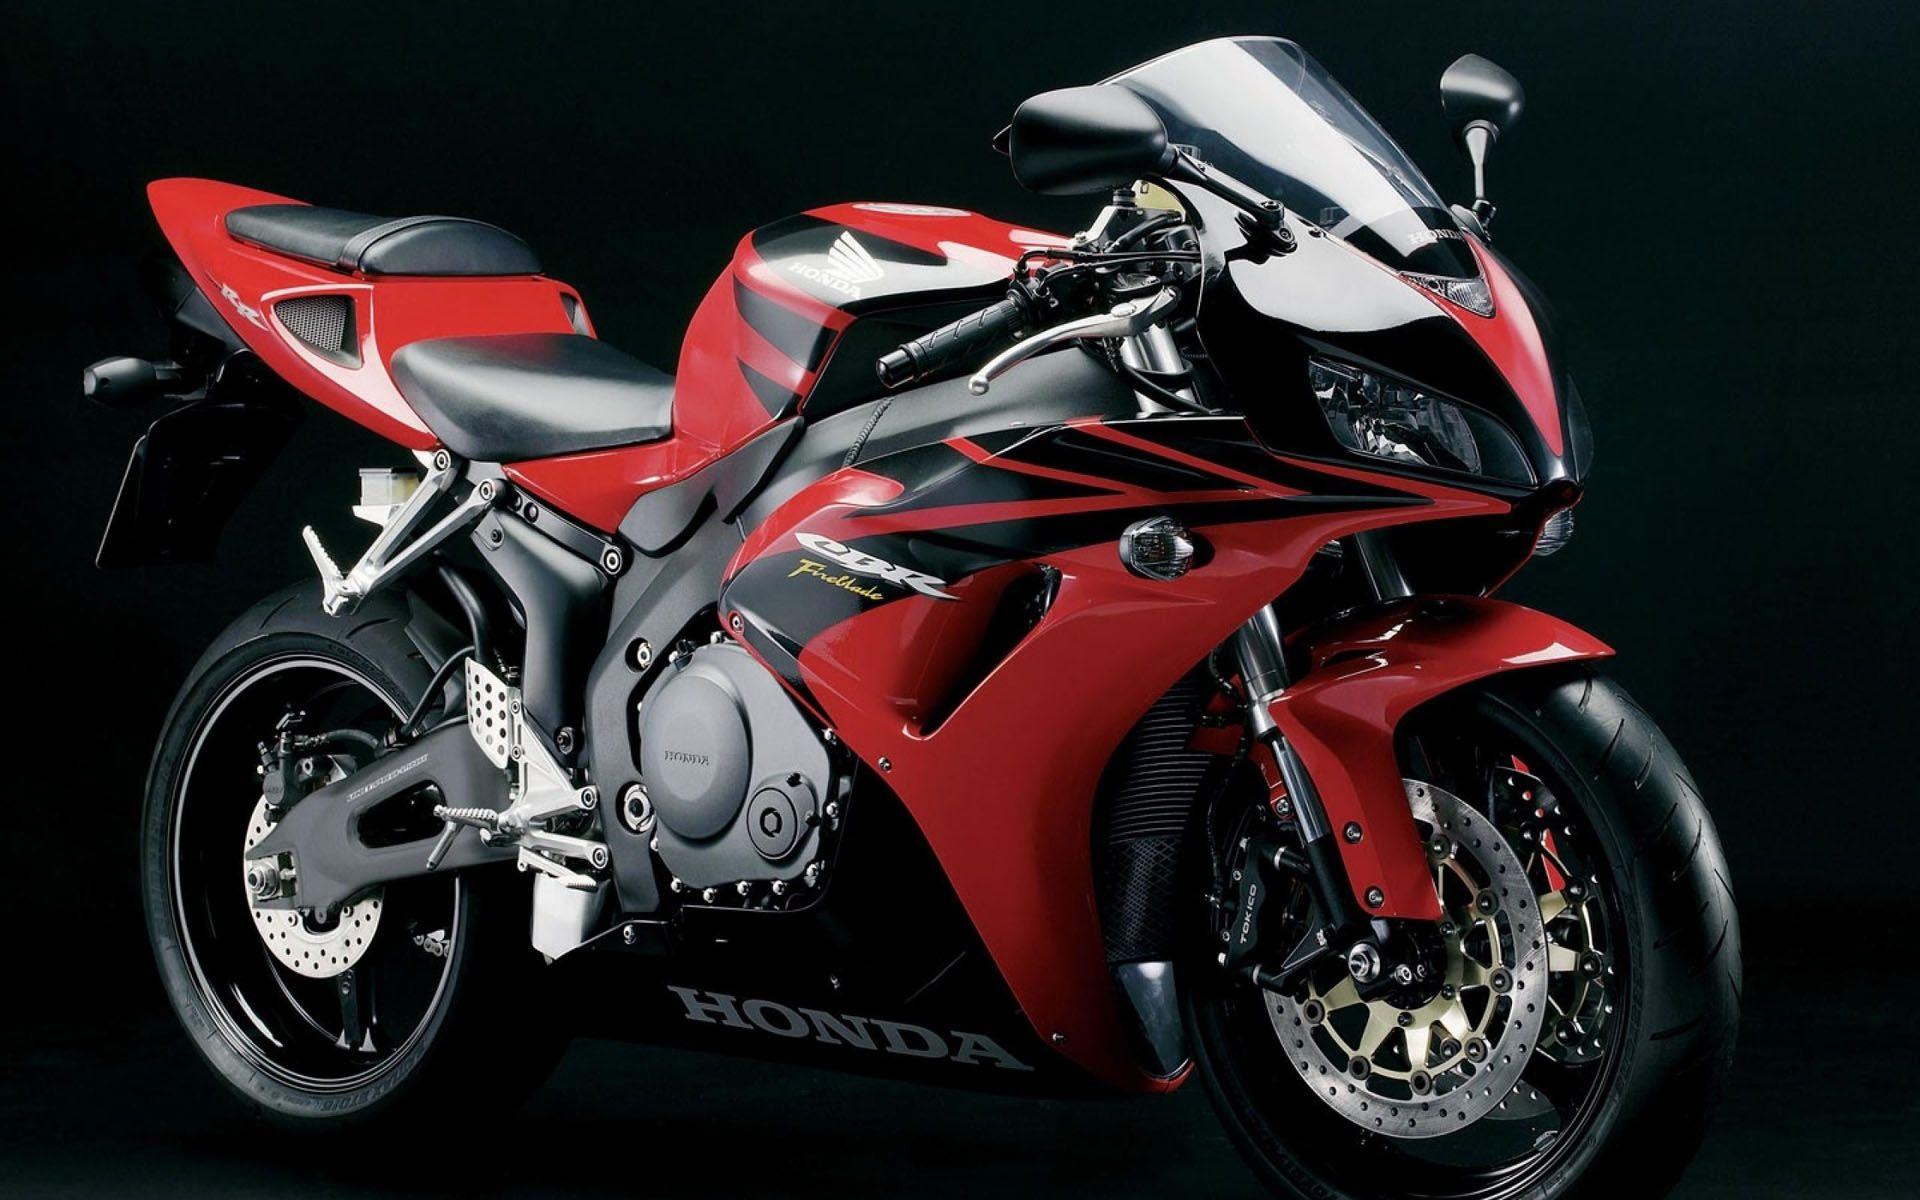 Honda cbr 2014 sports super sports bike photo - Honda Cbr 900rr Fireblade Honda Sport Bikesmotorcycle